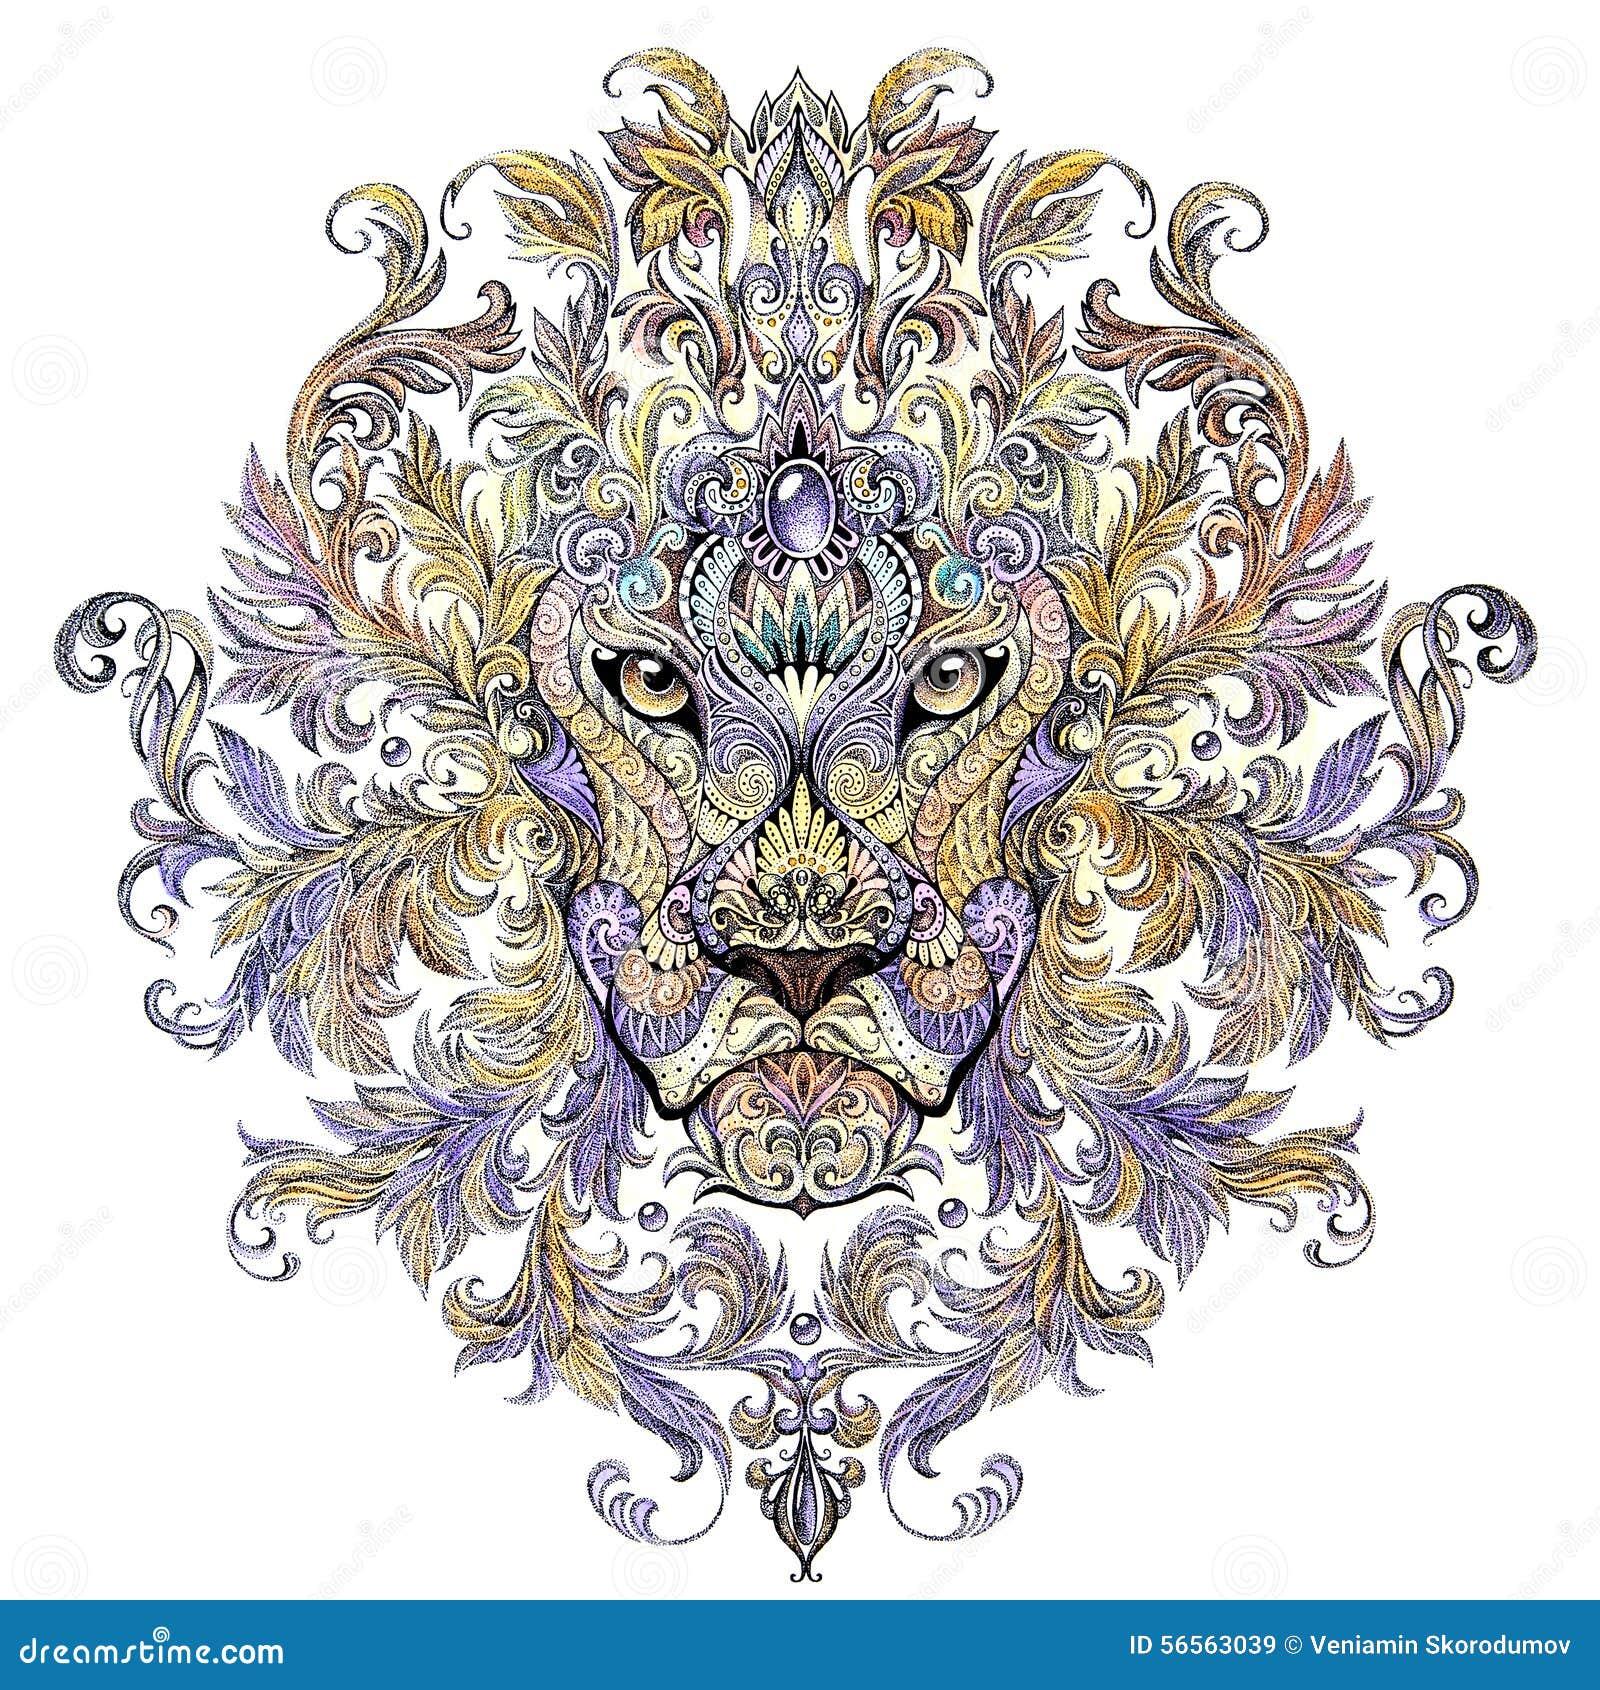 Download Δερματοστιξία, κεφάλι γραφικής παράστασης ενός λιονταριού με έναν Μάιν Απεικόνιση αποθεμάτων - εικονογραφία από κυνηγός, λιοντάρι: 56563039